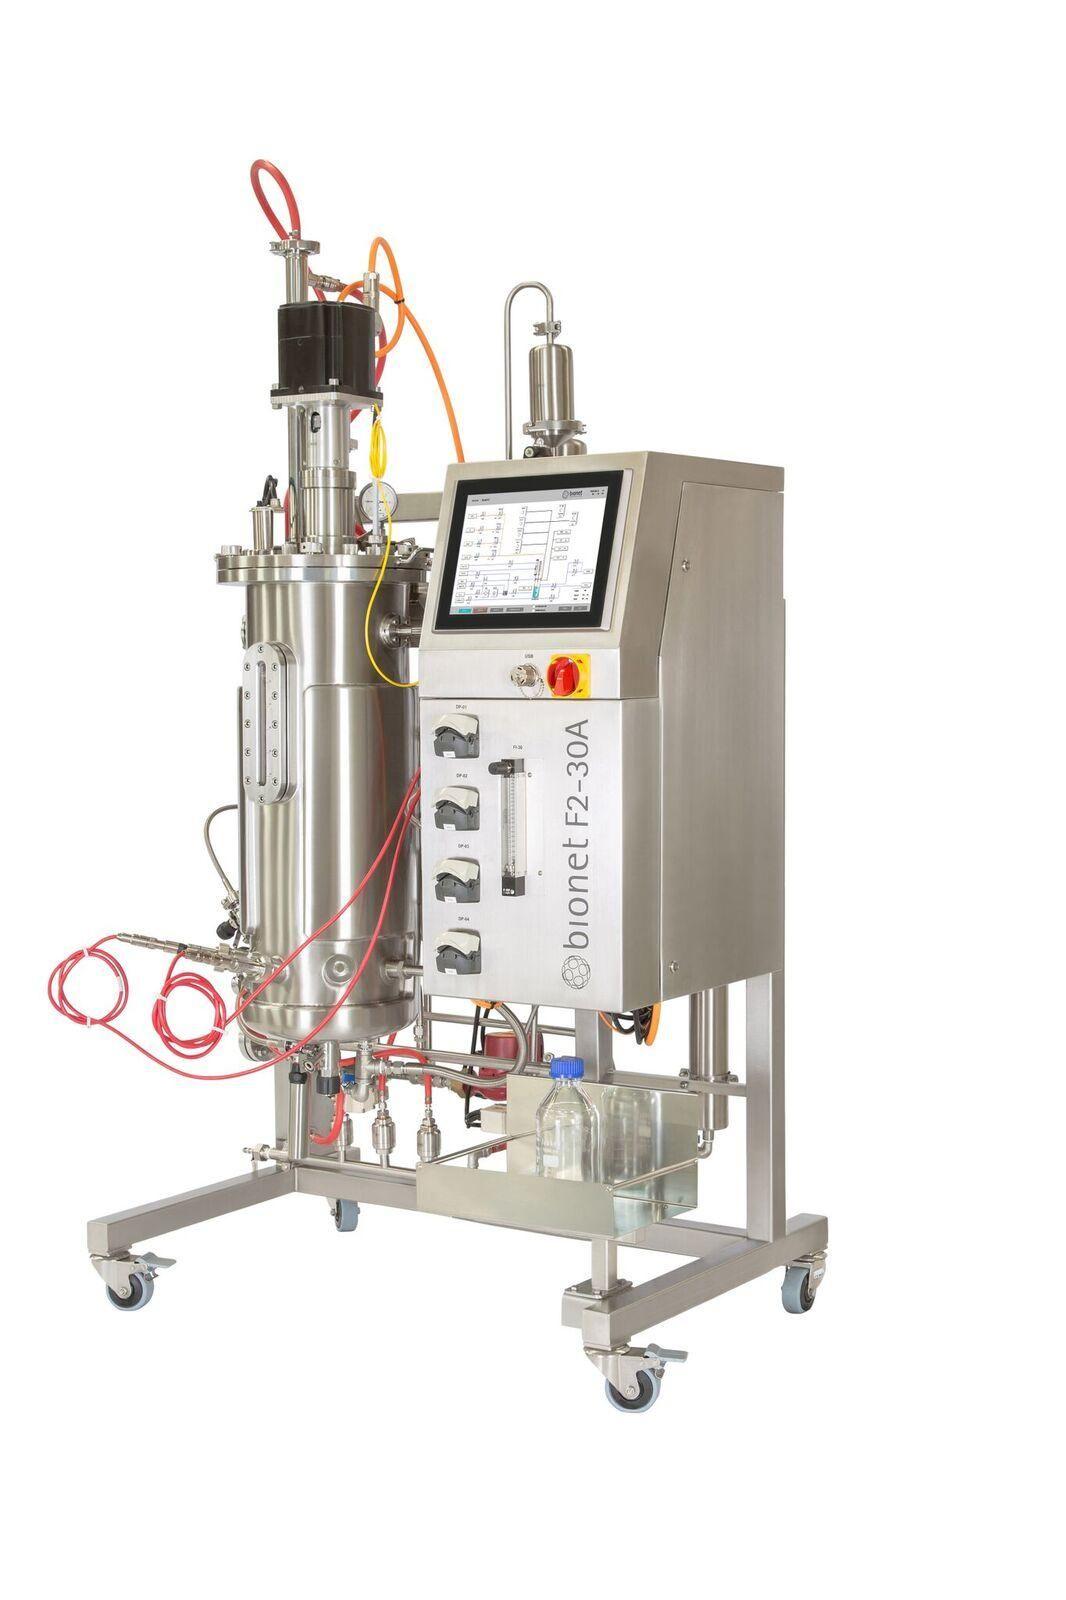 Fermenter Pilot SIP - 15-30 Litres, NEW From Bionet (Spain)